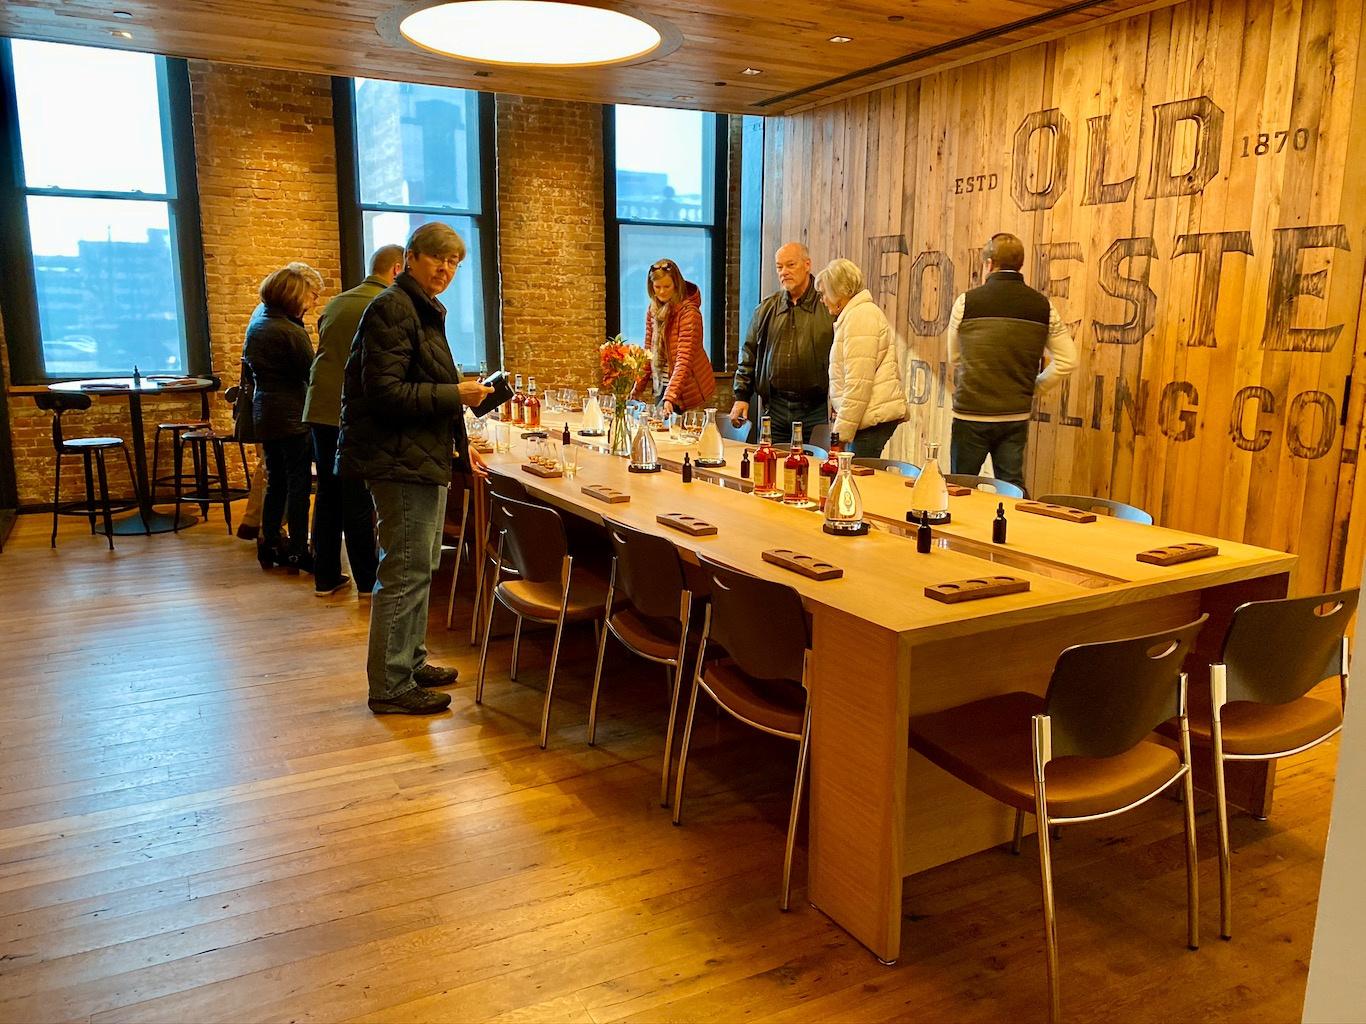 Tasting Room -Old Forester Distillery